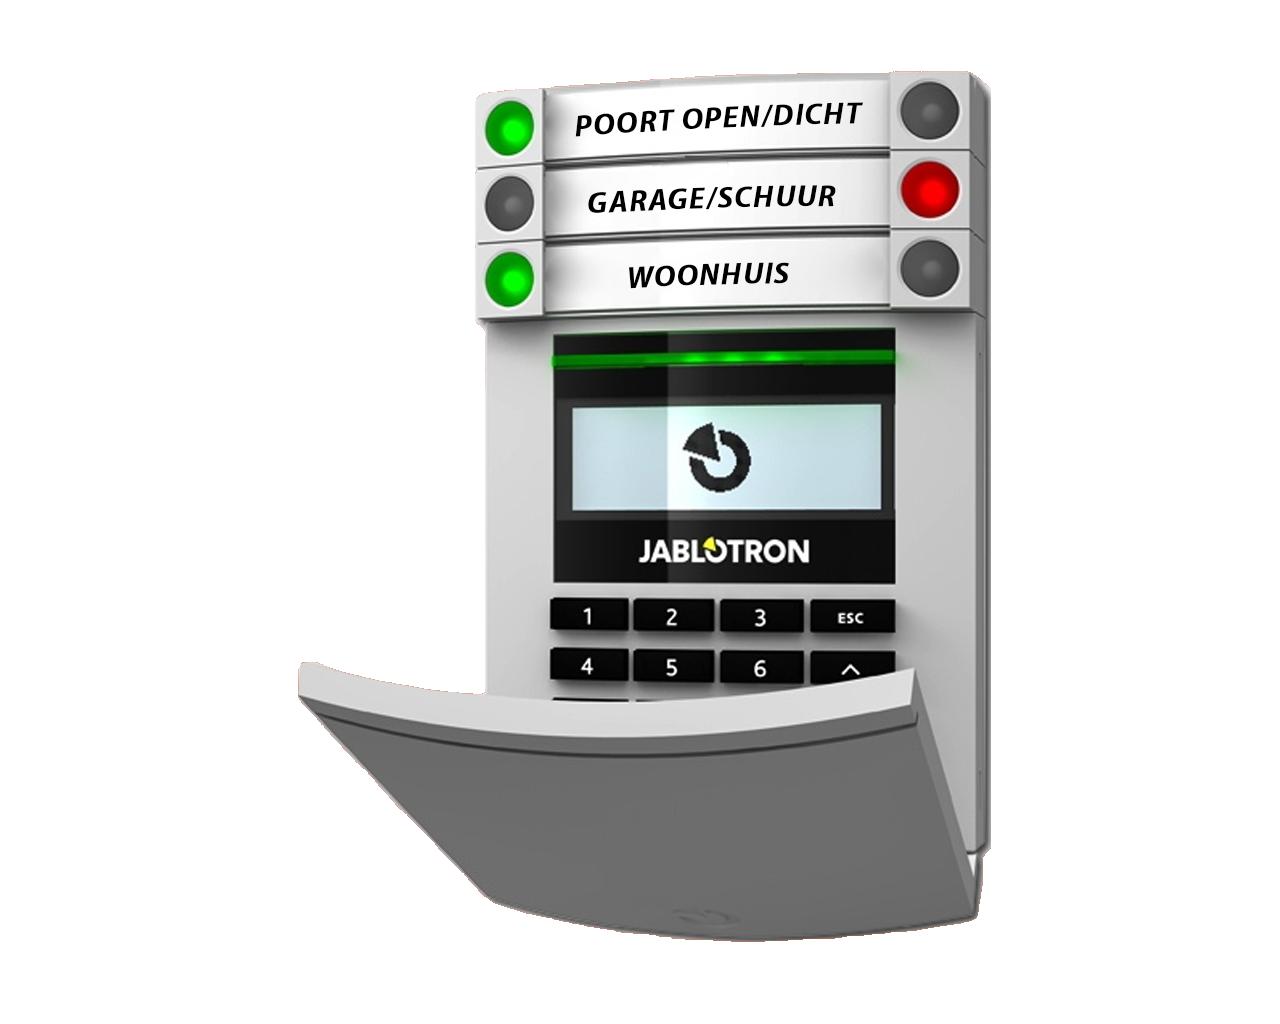 Jablotron-ja-154e JA151P-WG jABLOTRON design Bedienpaneel lcd codetoets draadloos alarmsysteem